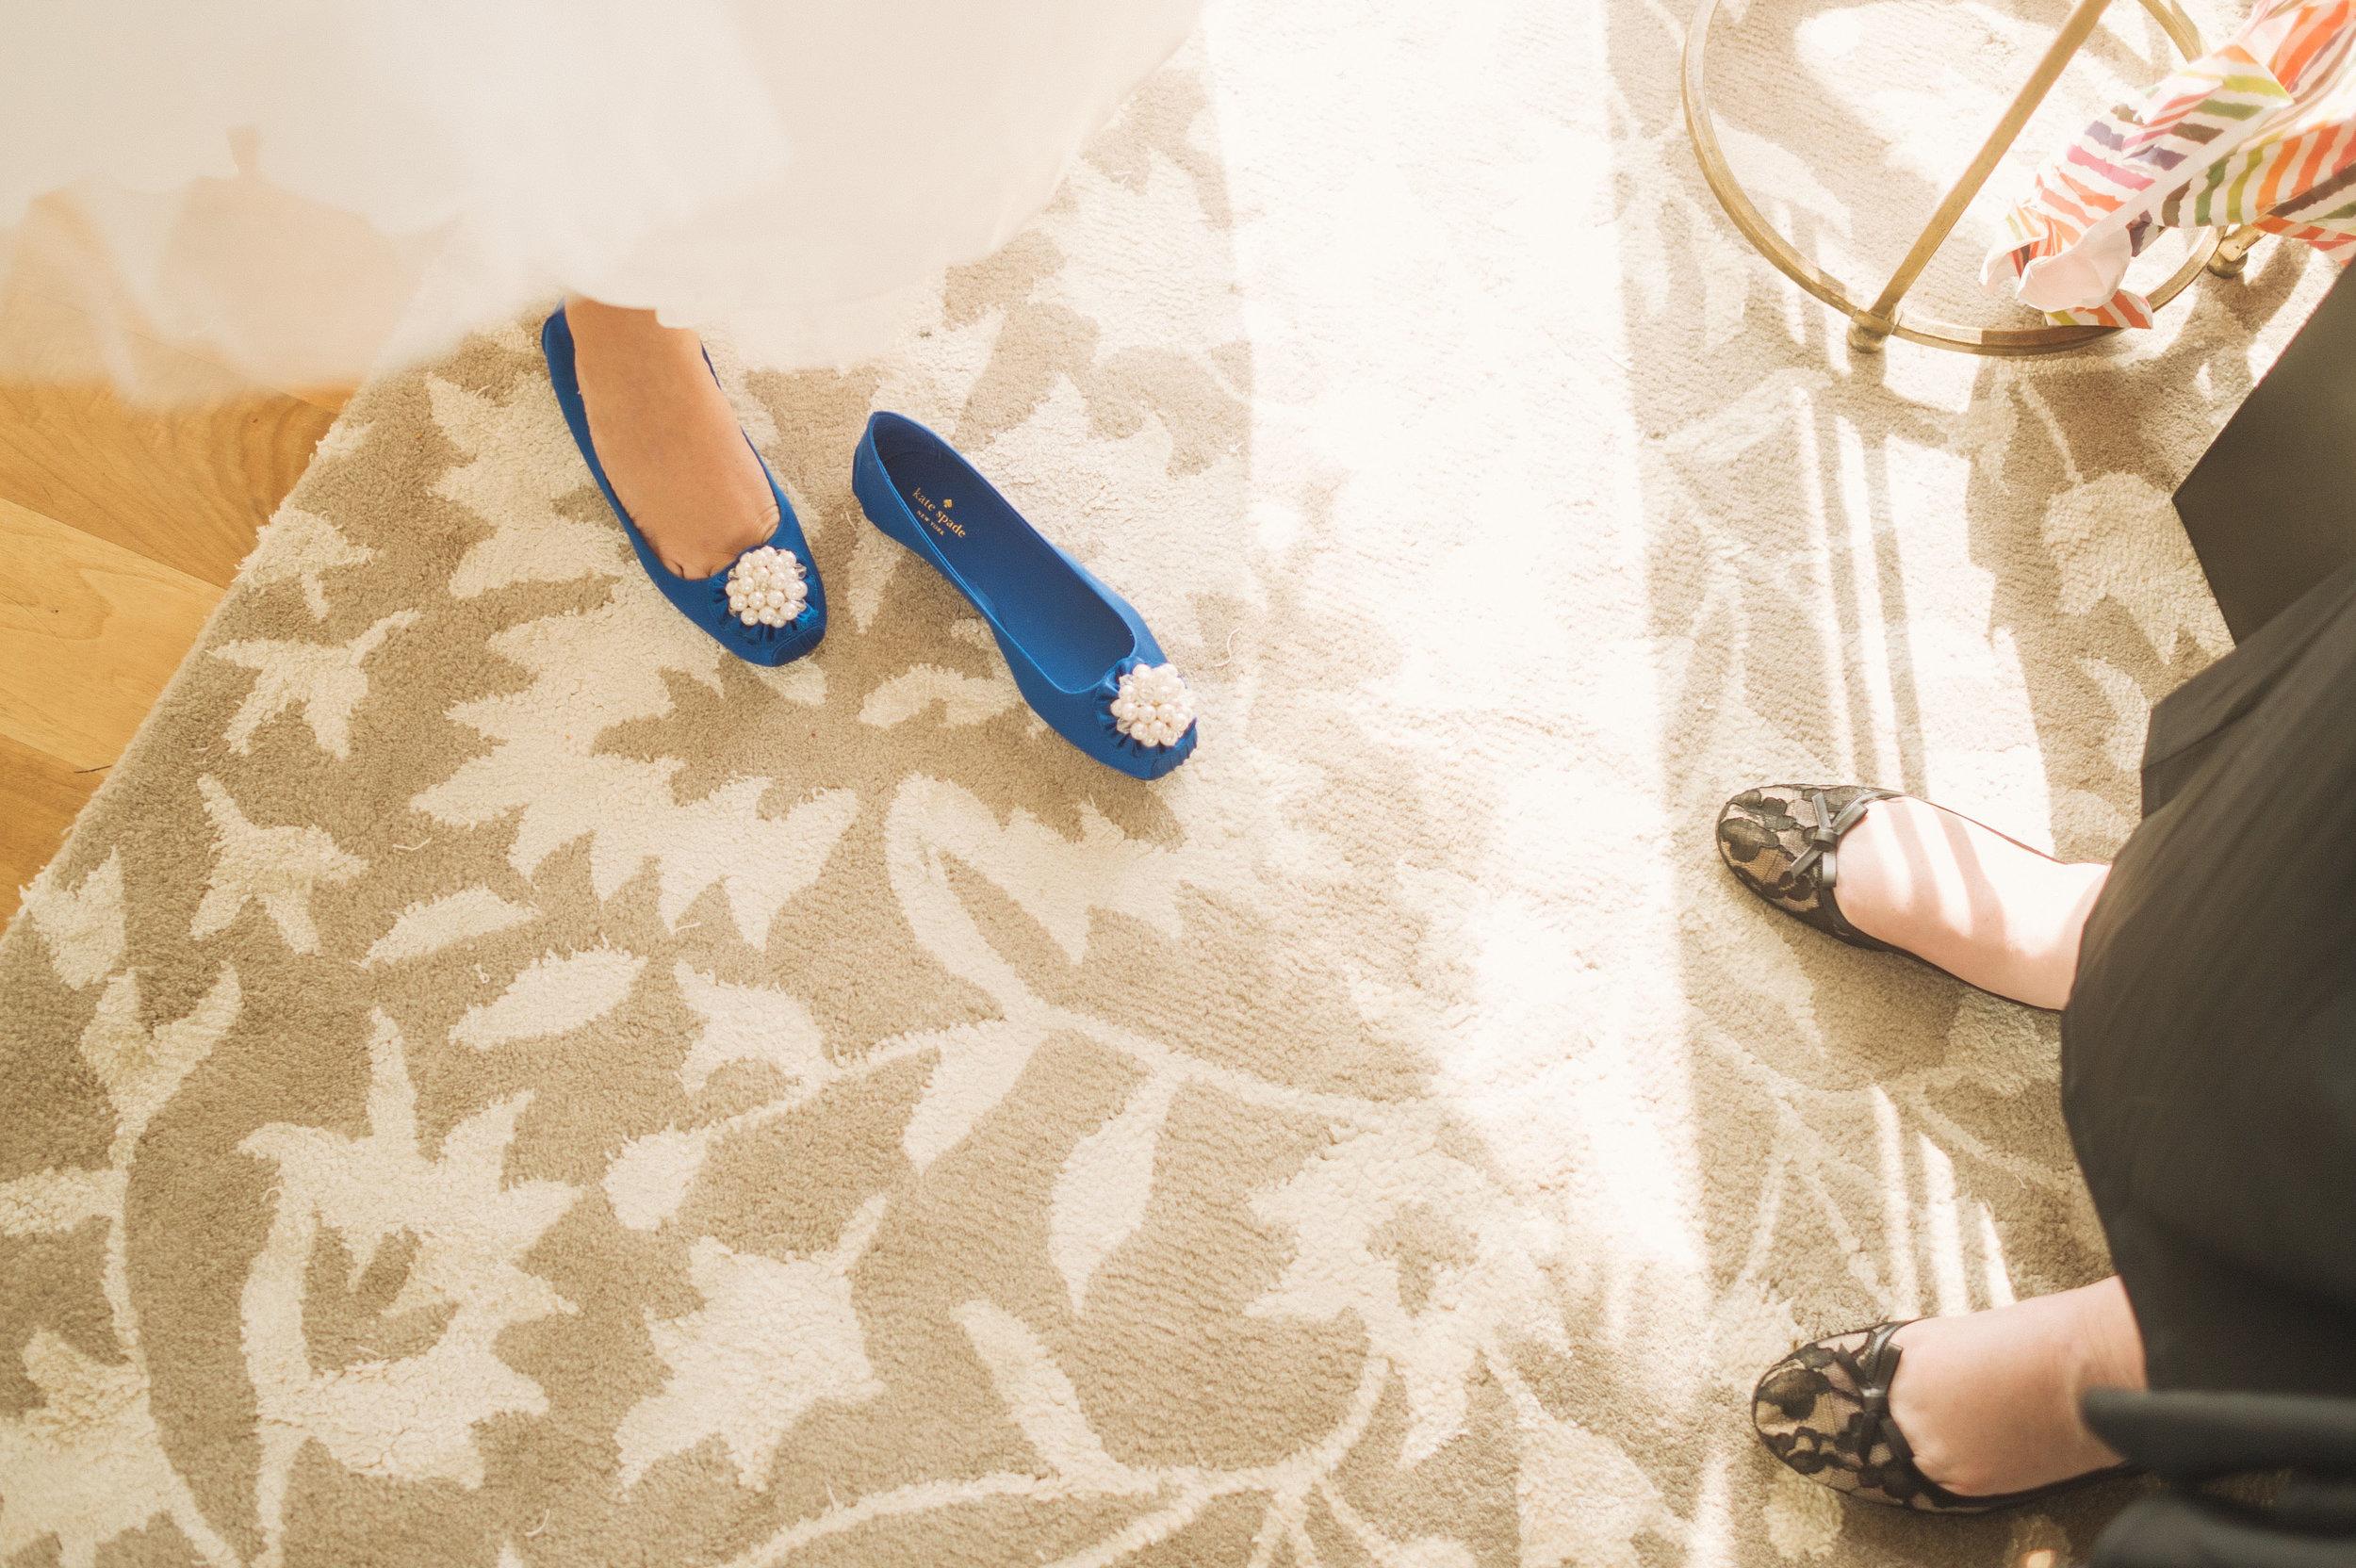 Blue Flats Wedding Shoes